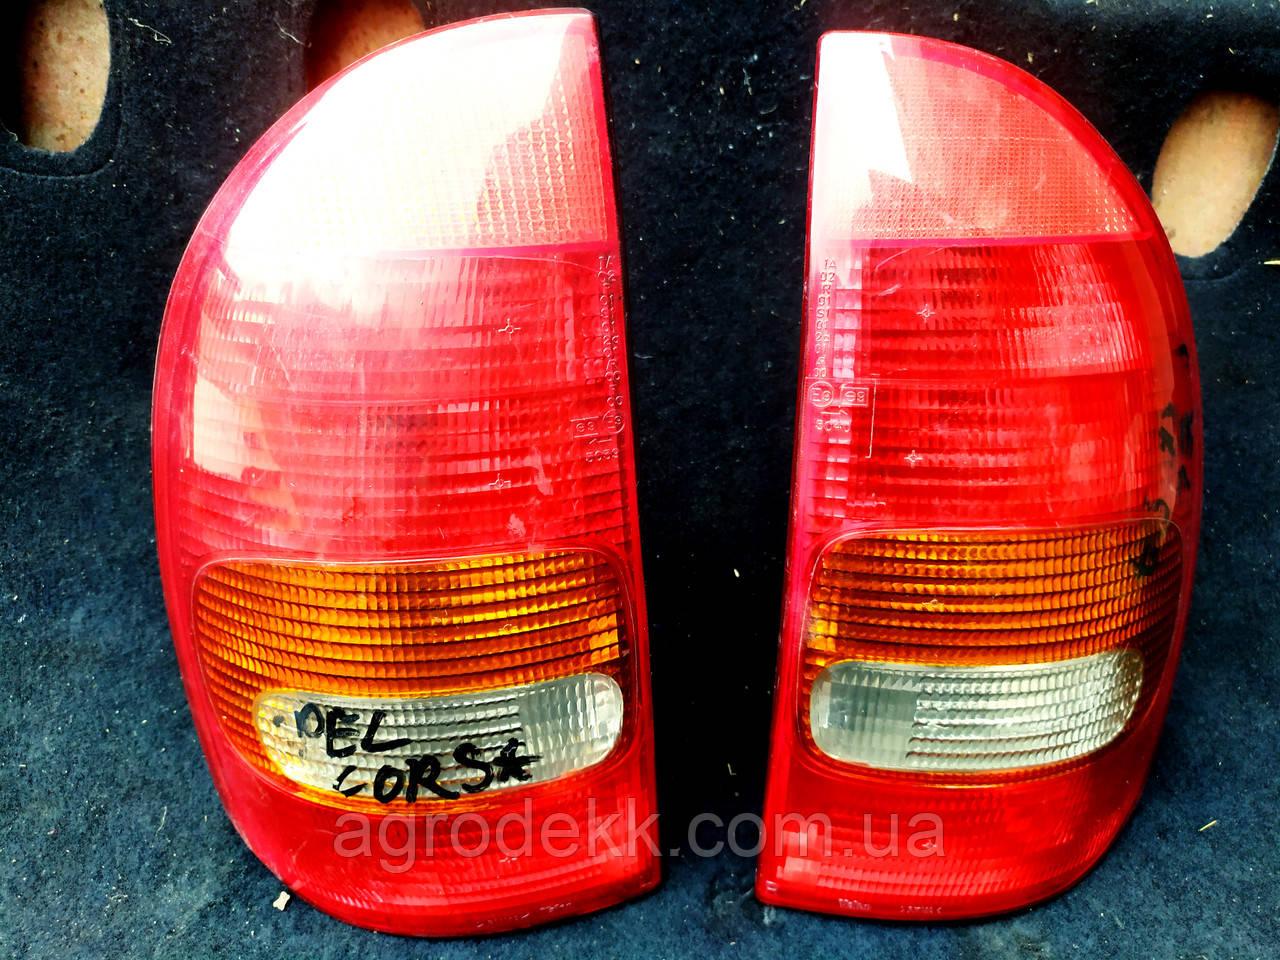 Фара задняя opel corsa b 1993-2002